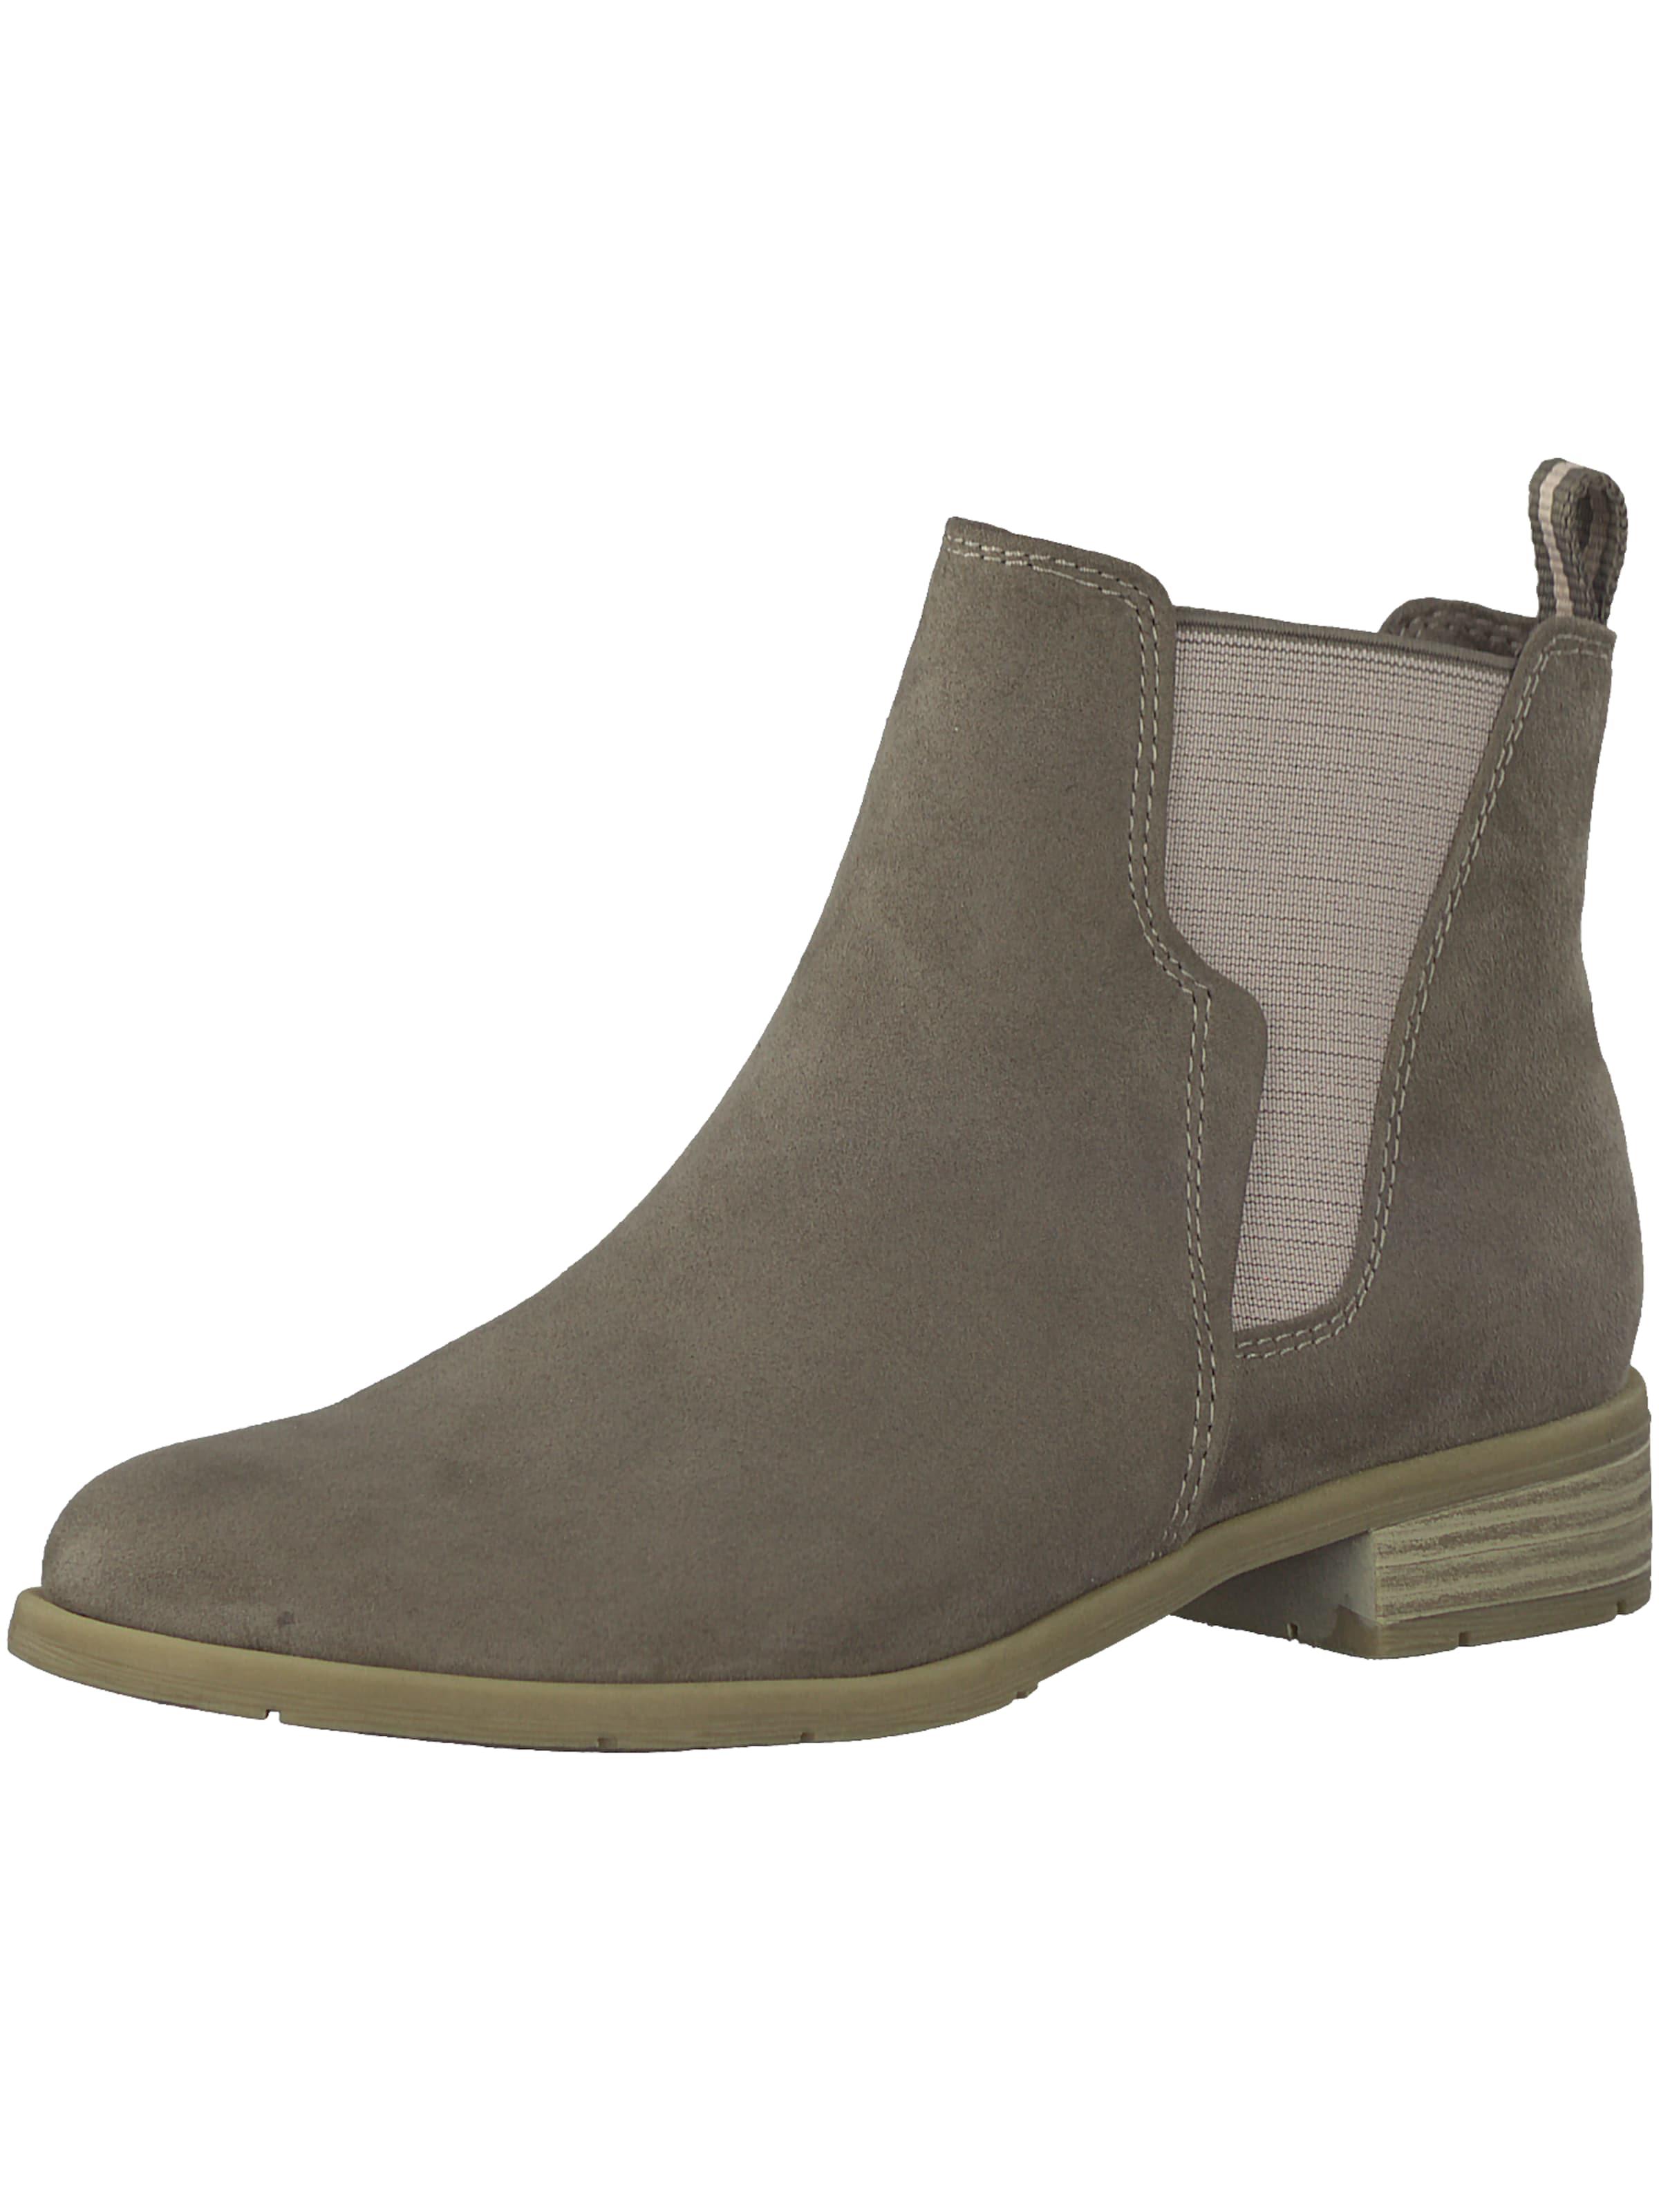 Taupe En Boots Chelsea Tozzi Marco LMGSUjqpzV